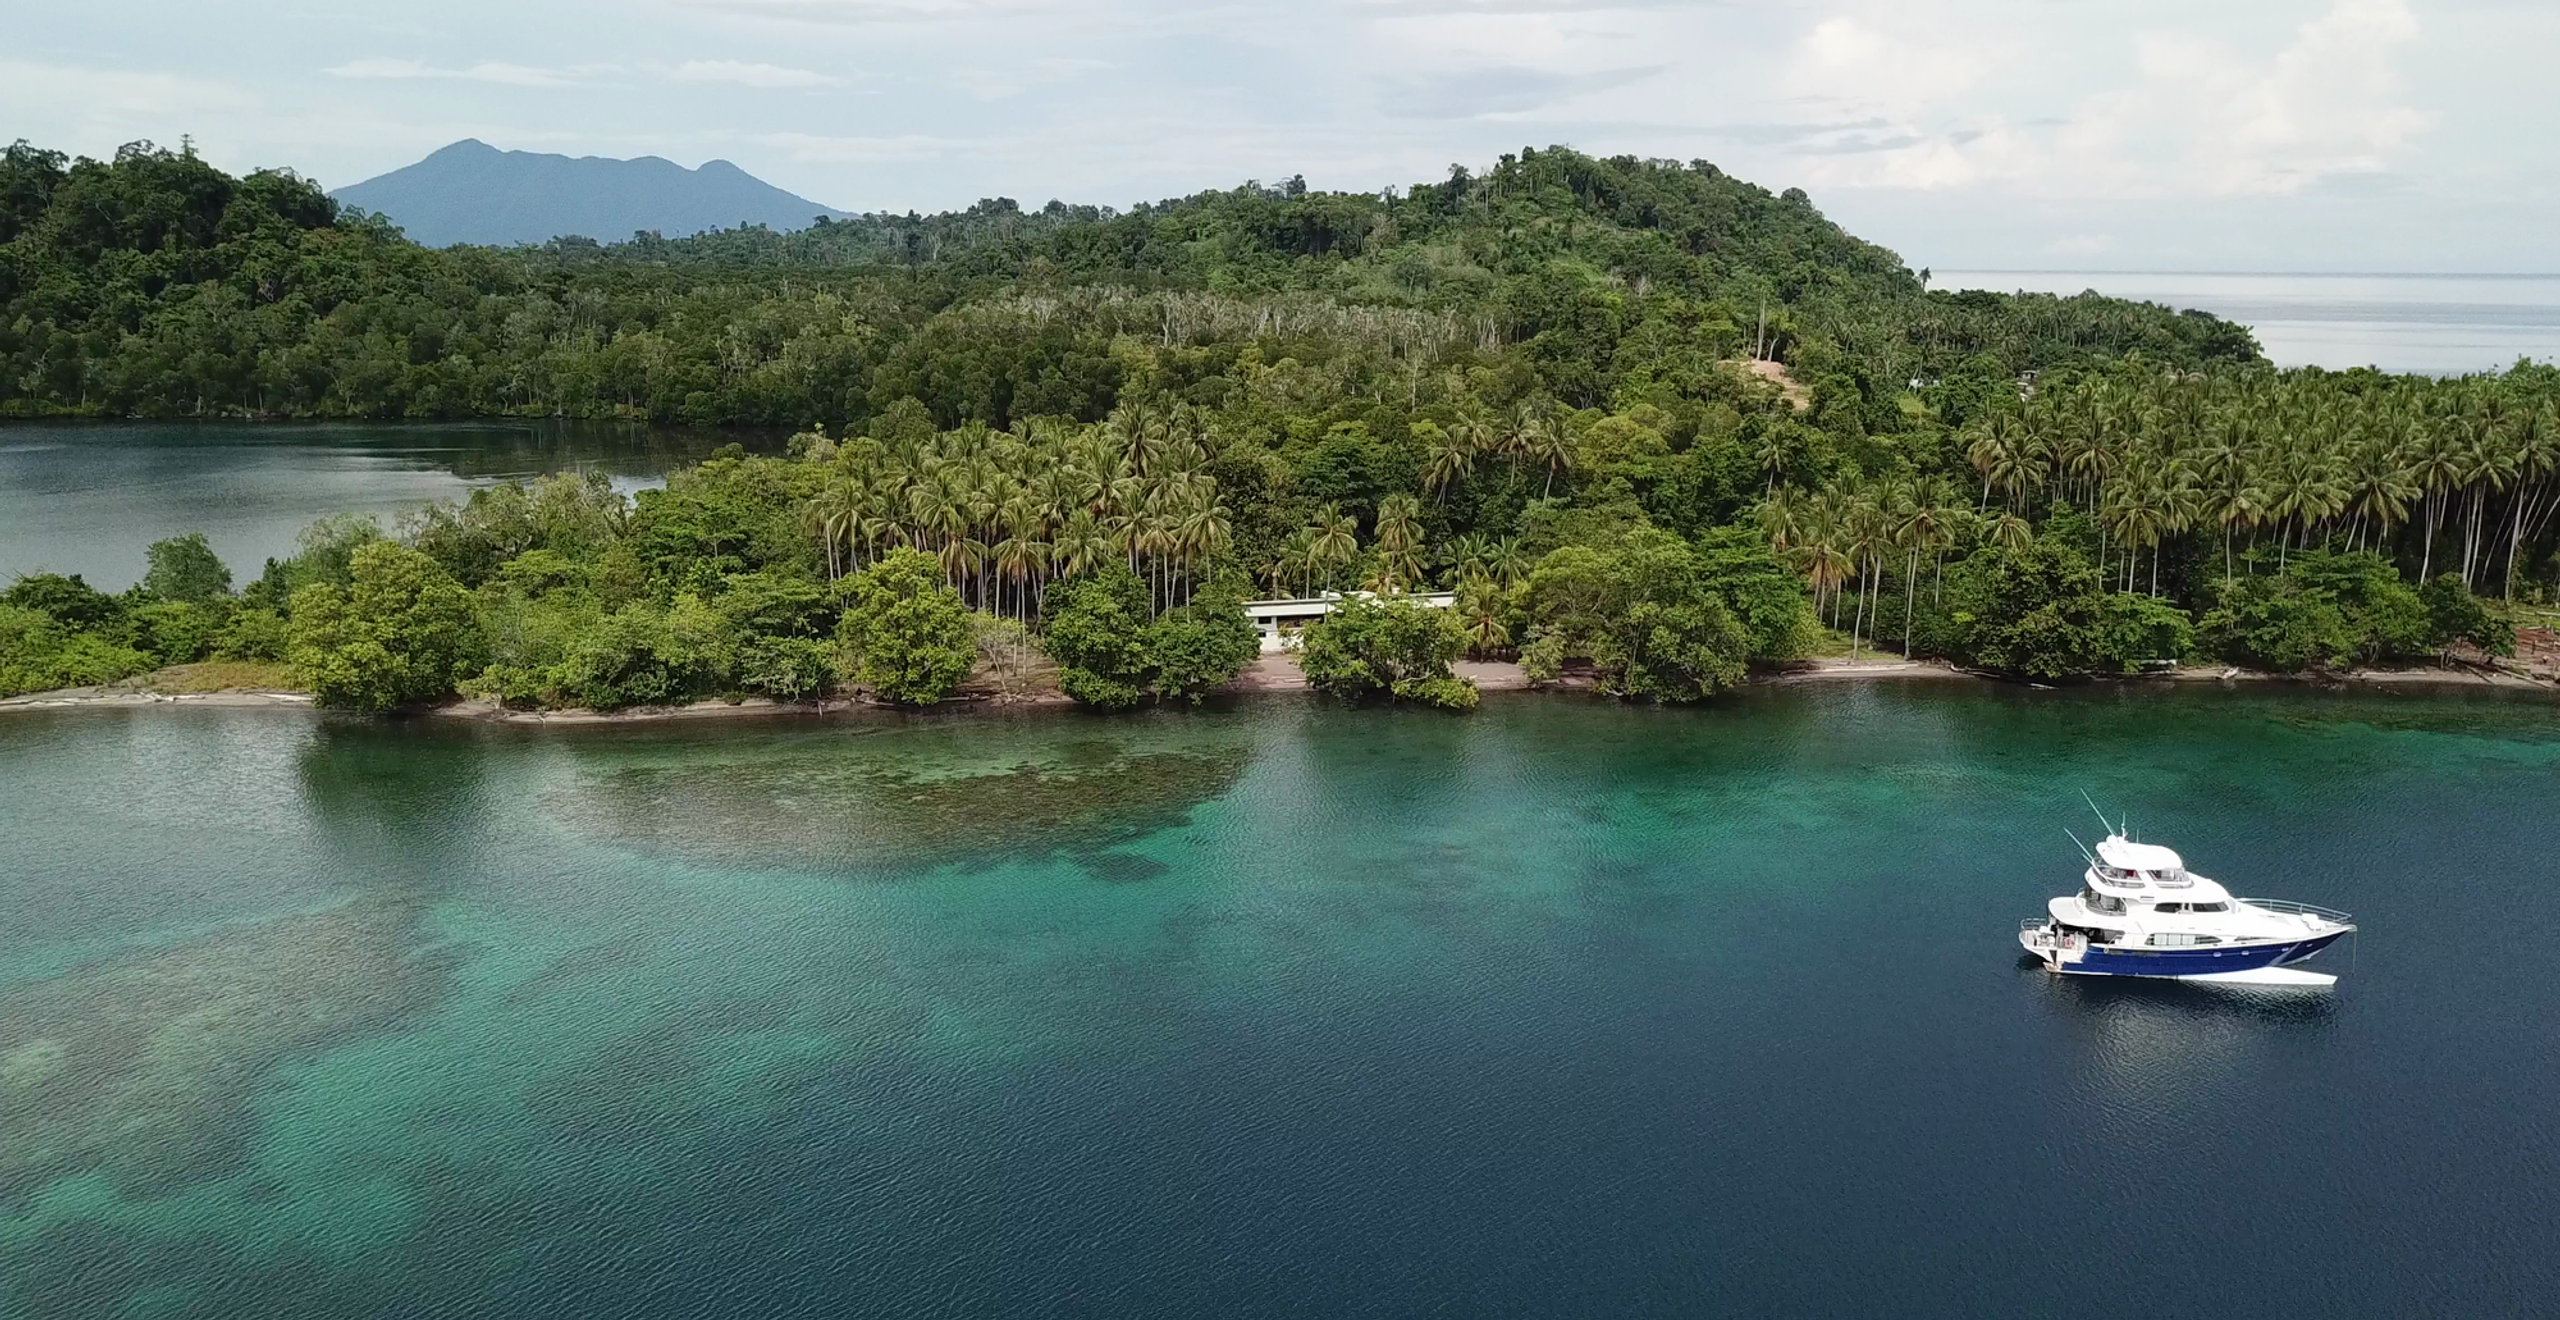 Ultimate One & Baia Sportfishing - Papua New Guinea Fishing & Holidays